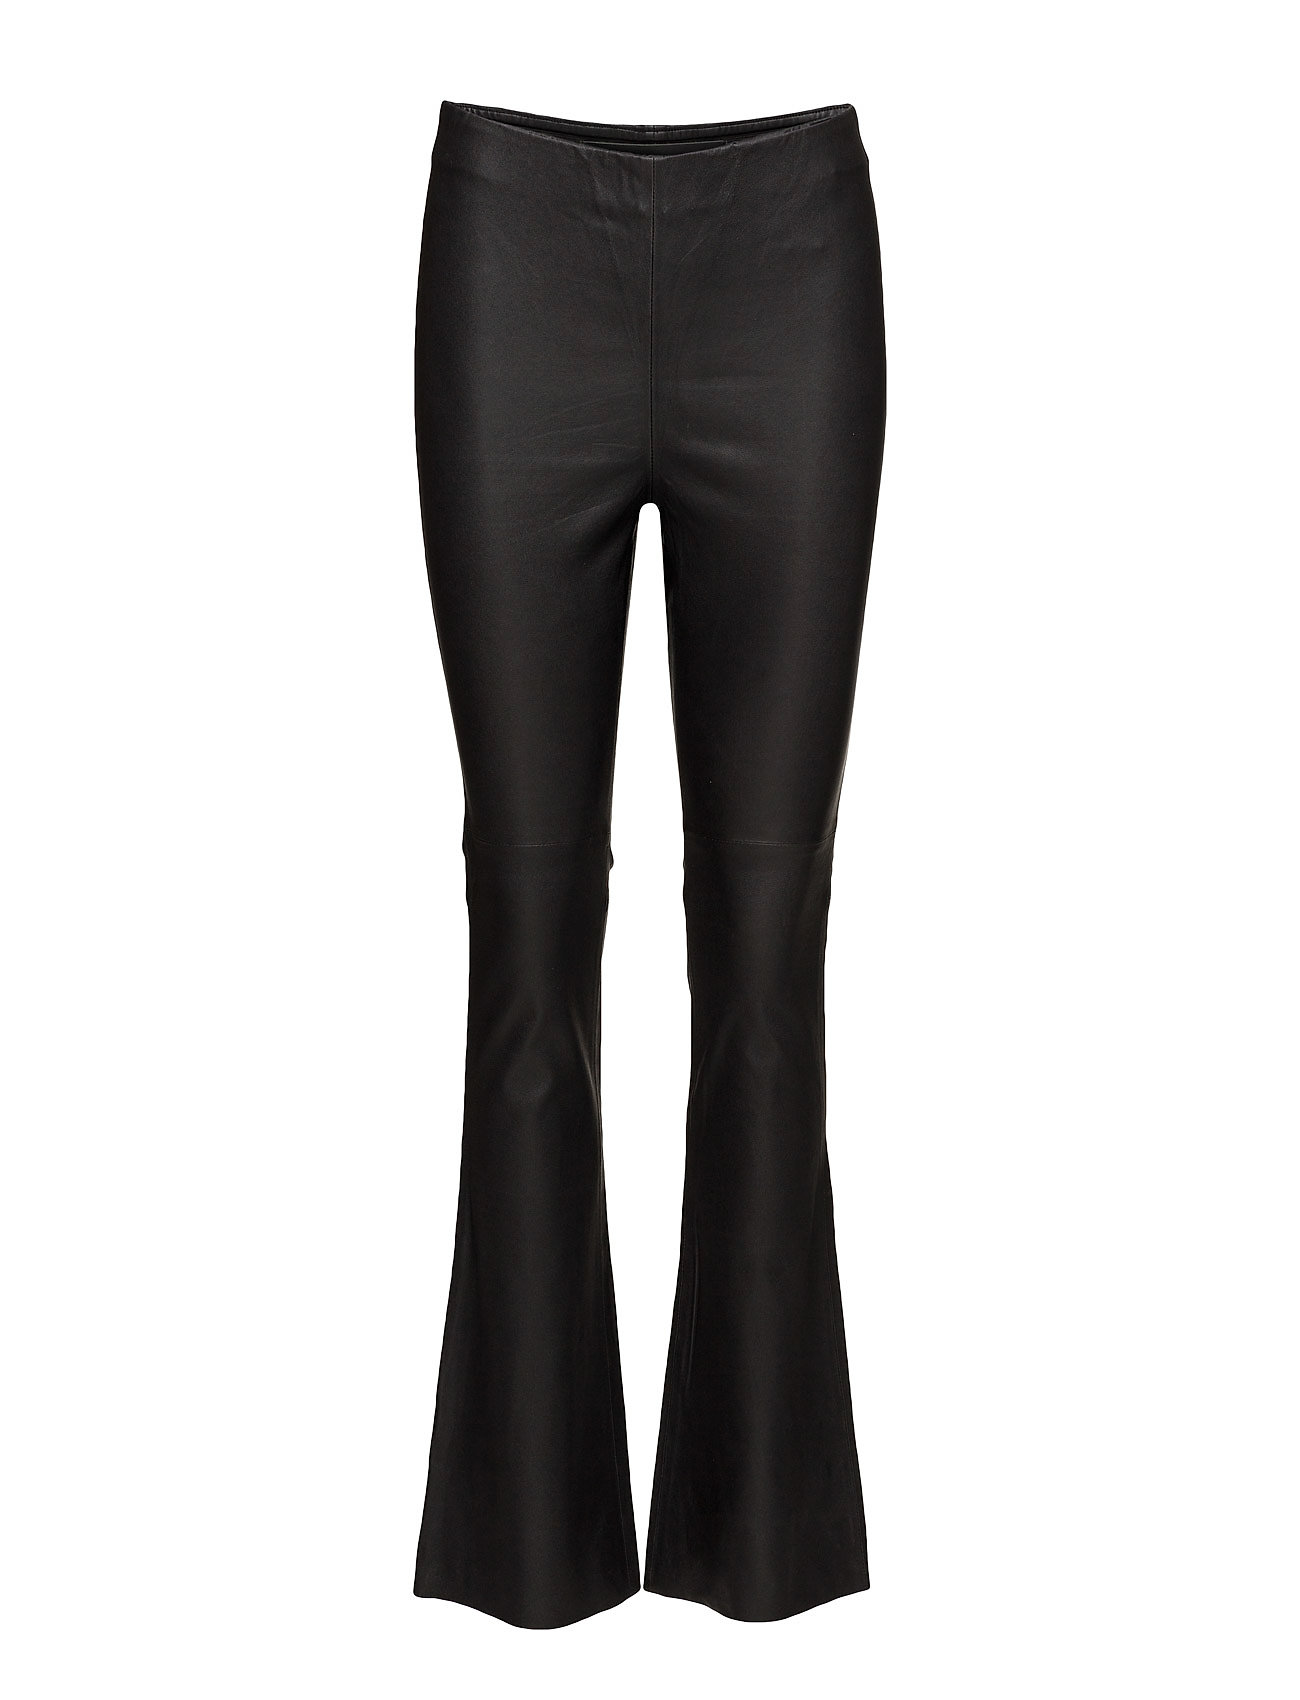 Flare Leather Trousers MDK / Munderingskompagniet  til Damer i Sort